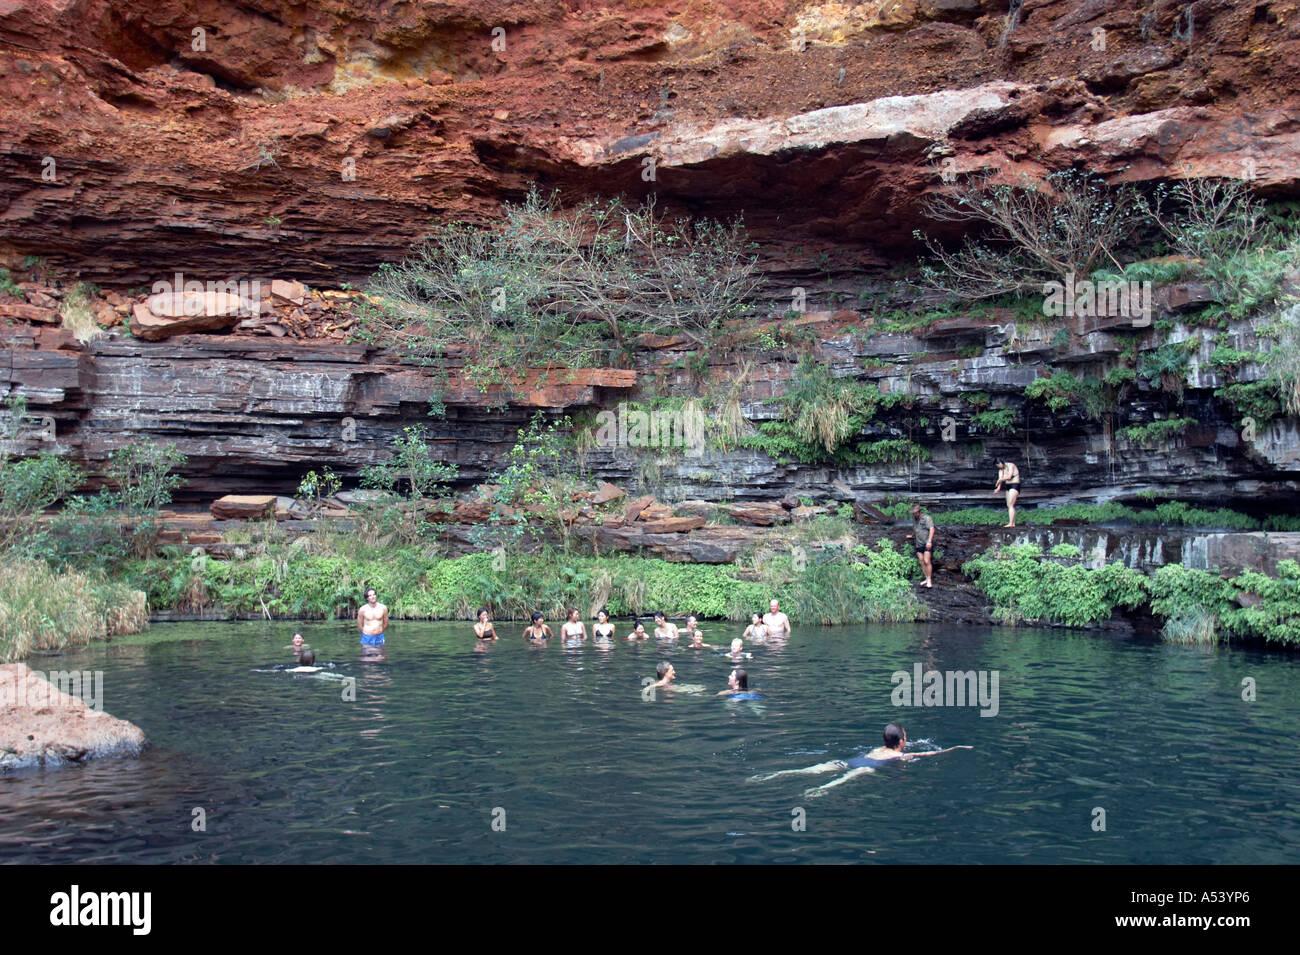 Tourists Swim In Circular Pool Dales Gorge Karijini National Park Stock Photo Royalty Free